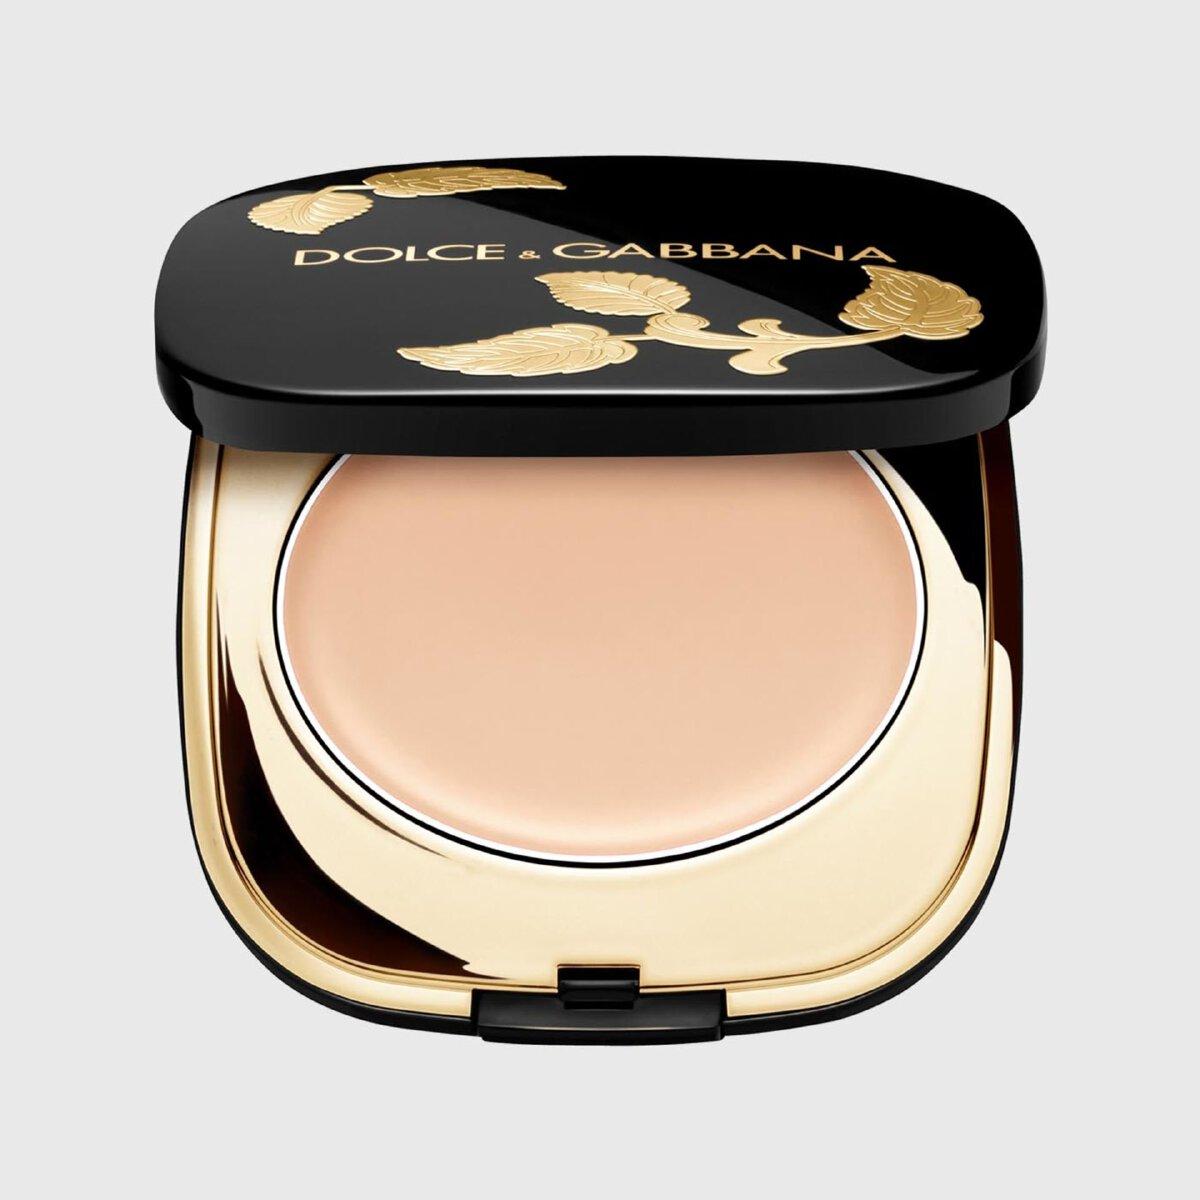 Dolce & Gabbana Creamy Cheek & Lip Colour